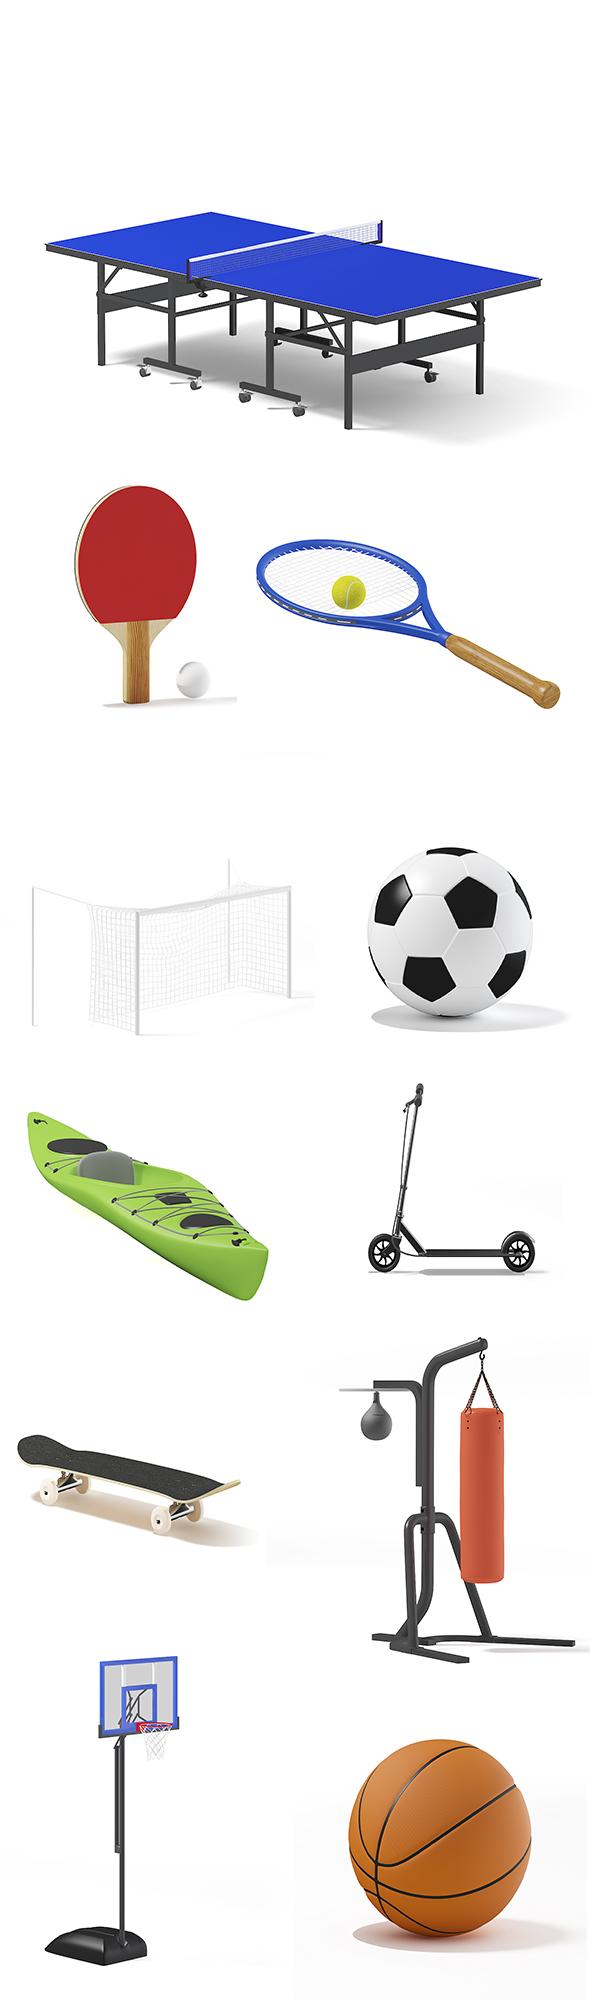 Sport Equipment - 3DOcean Item for Sale